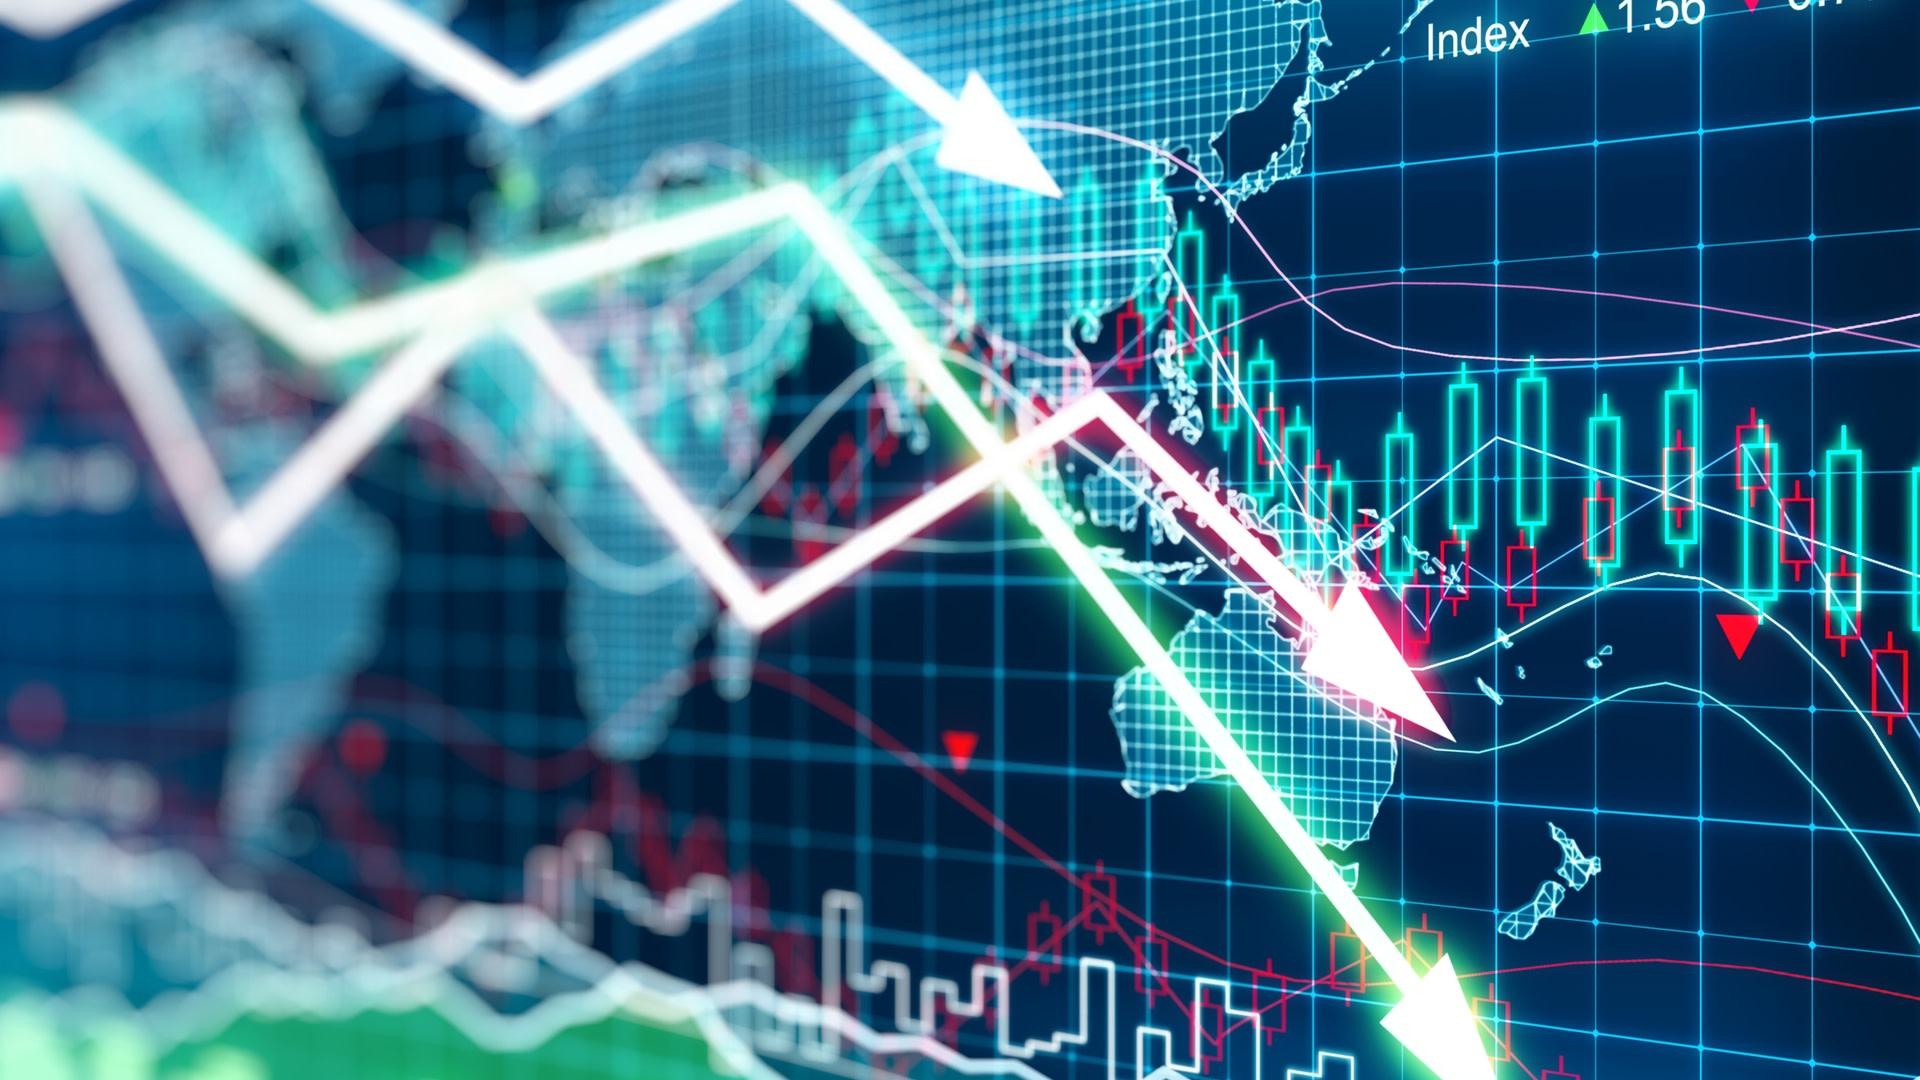 NYSE: BAC | Bank of America Corporation  News, Ratings, and Charts